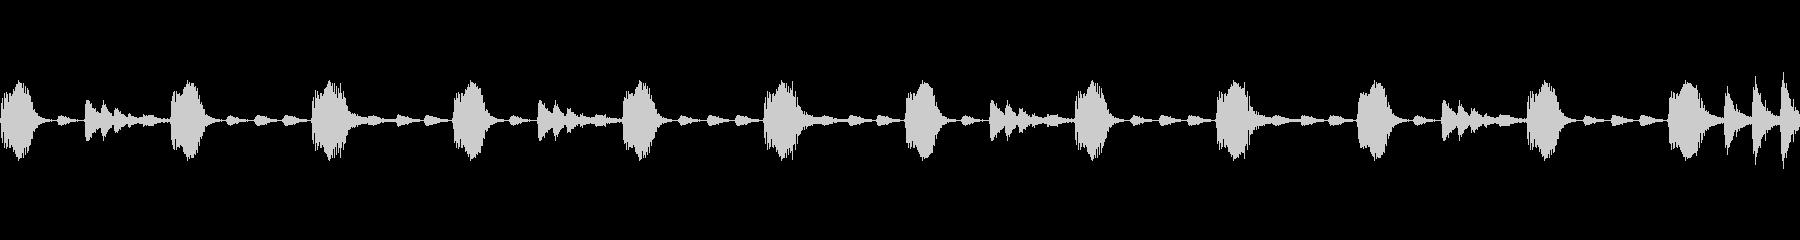 Electro リズムパターンの未再生の波形